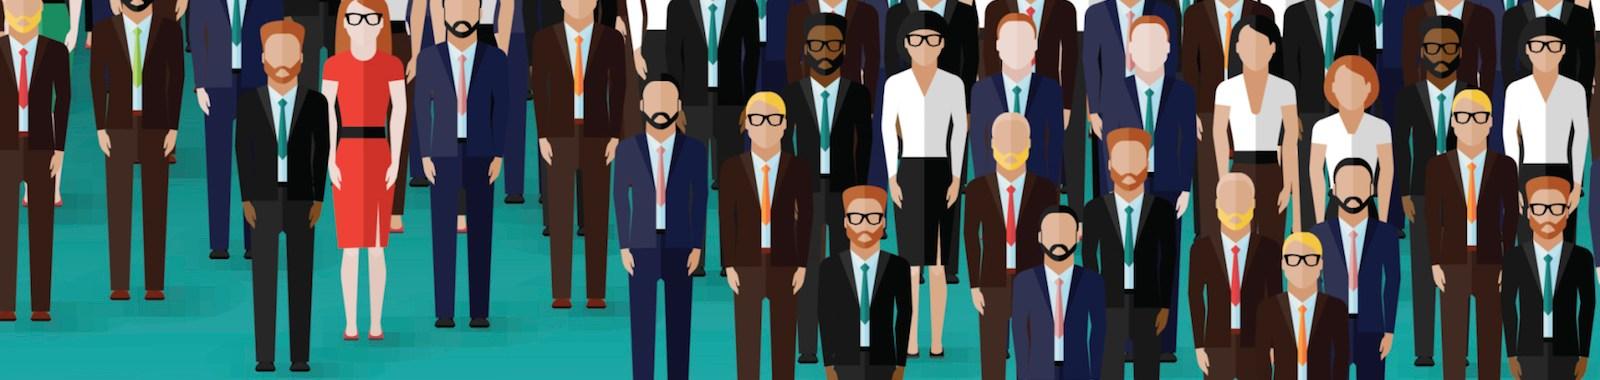 vector flat illustration of business or politics community